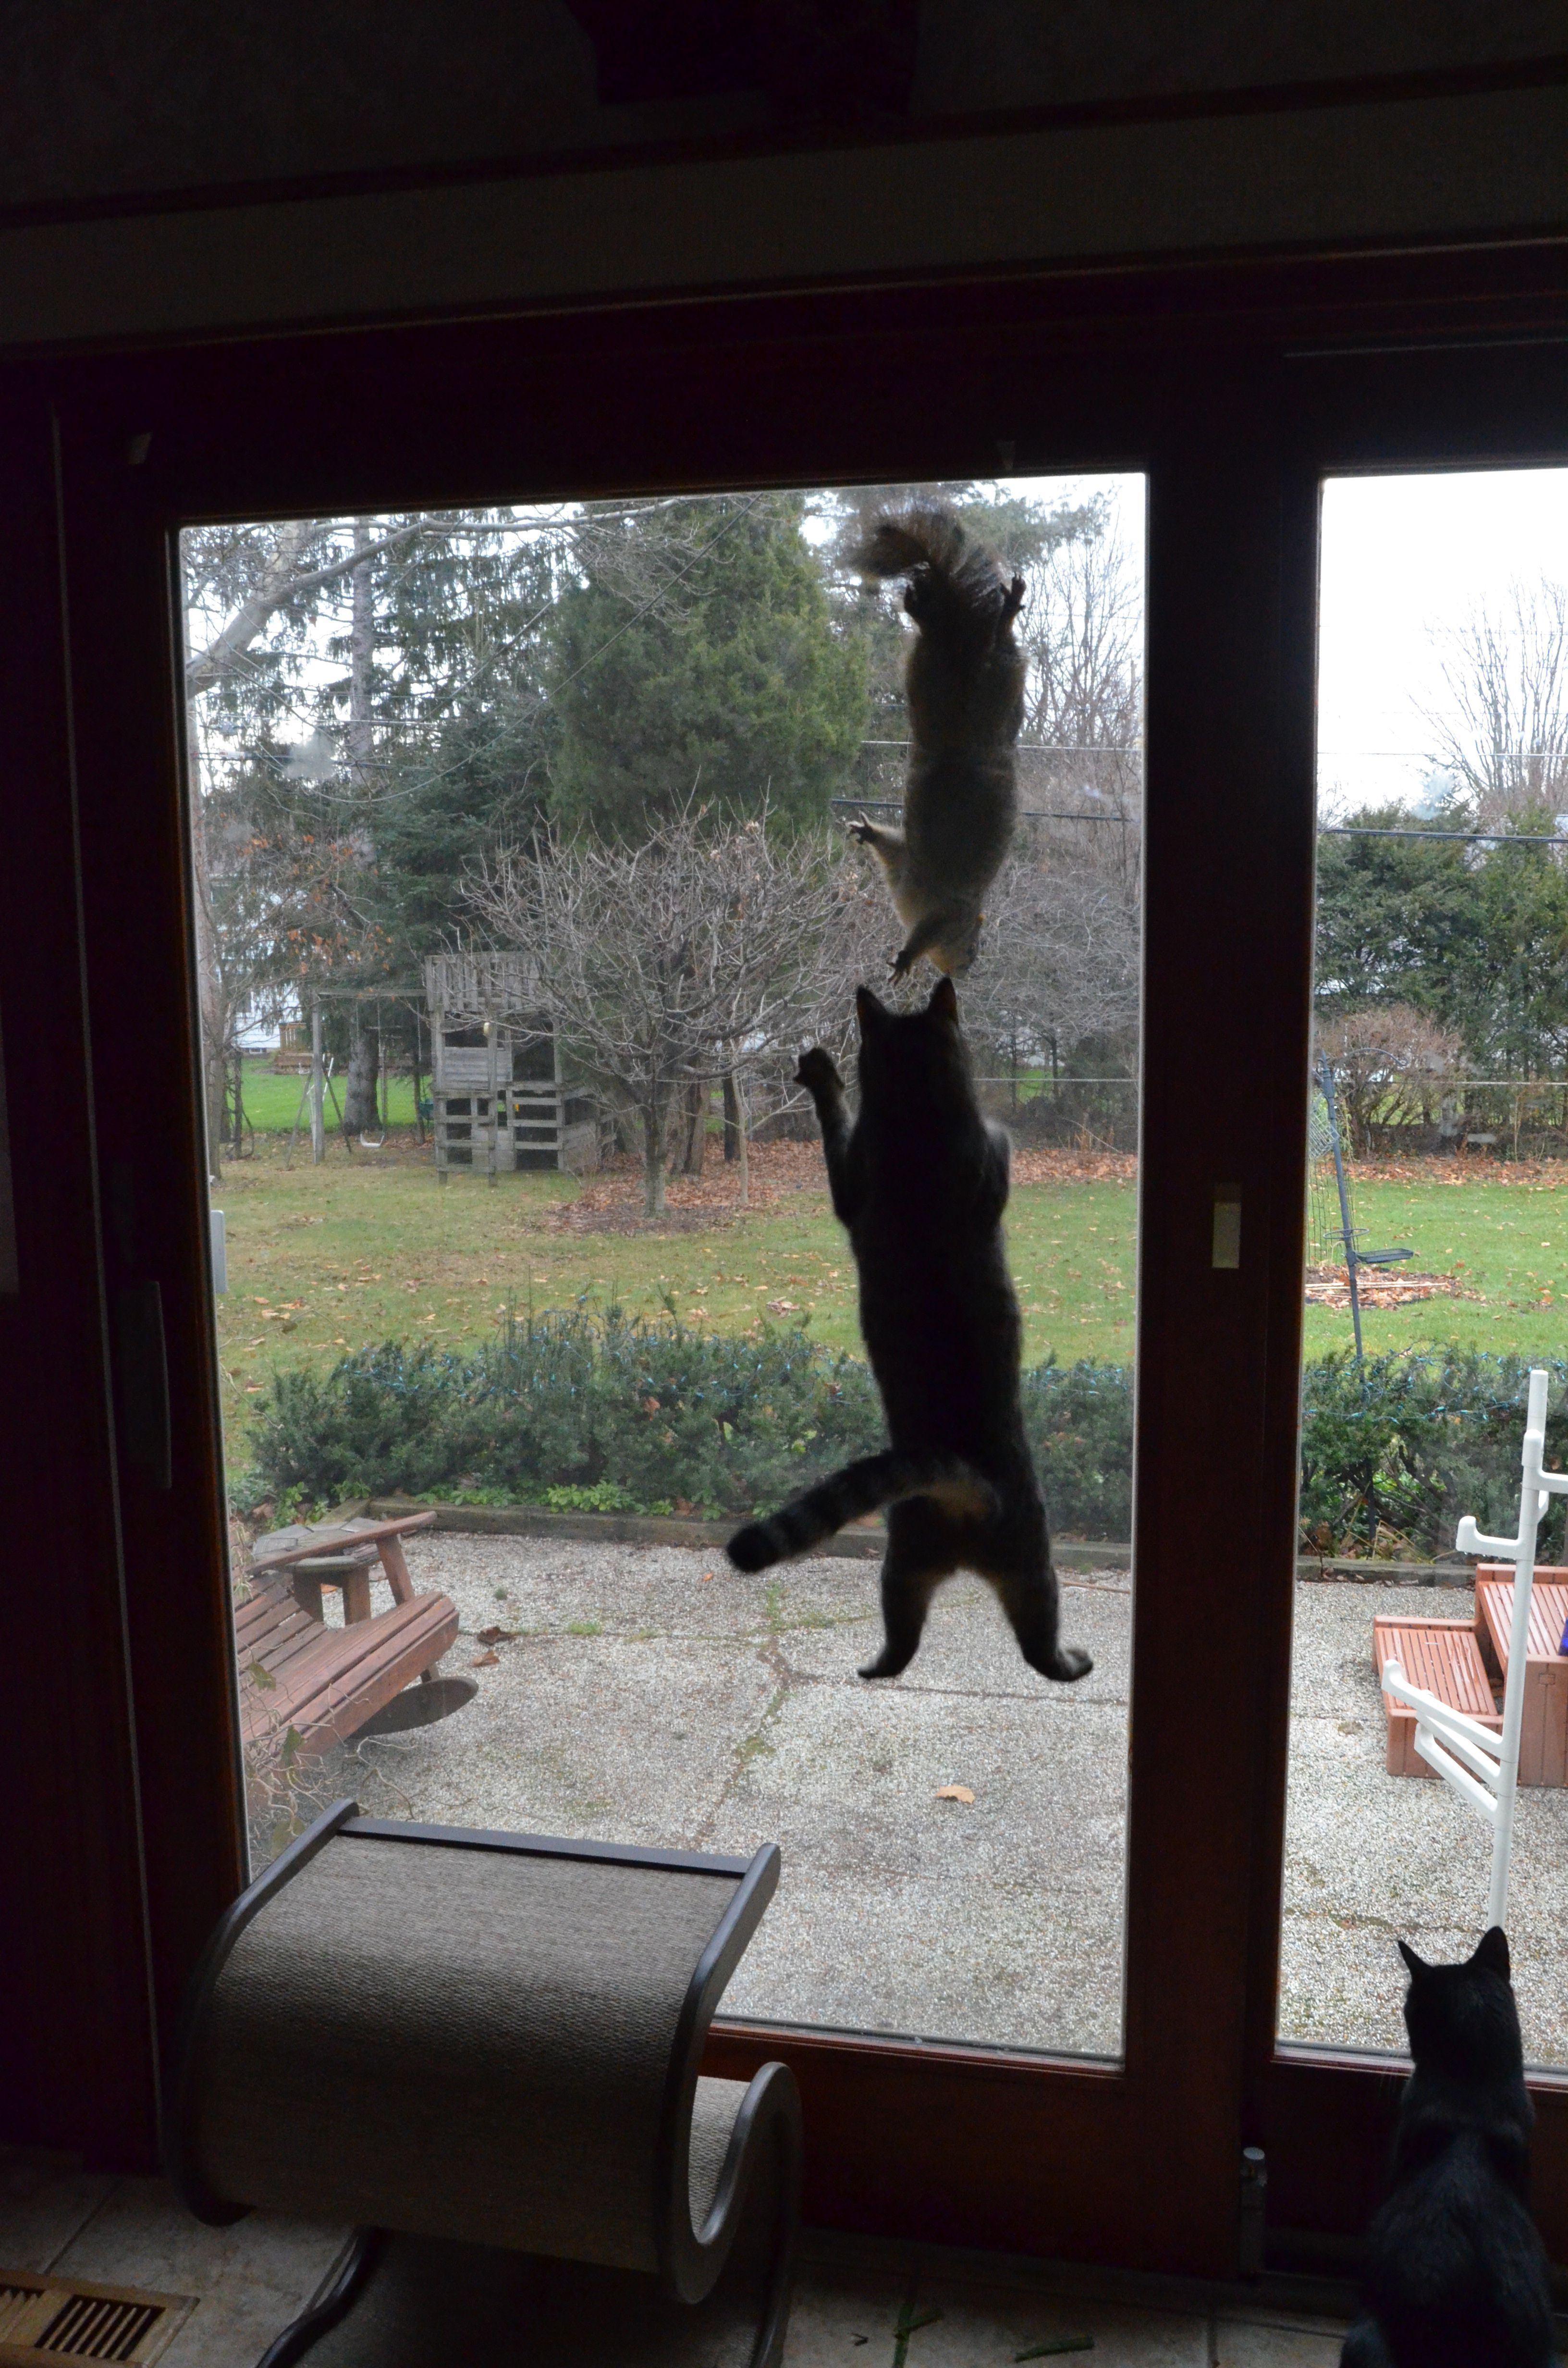 Inside Cat Squirrel On The The Screen Outside Cat Going Crazy Trying Katten Paarden En Hoeden